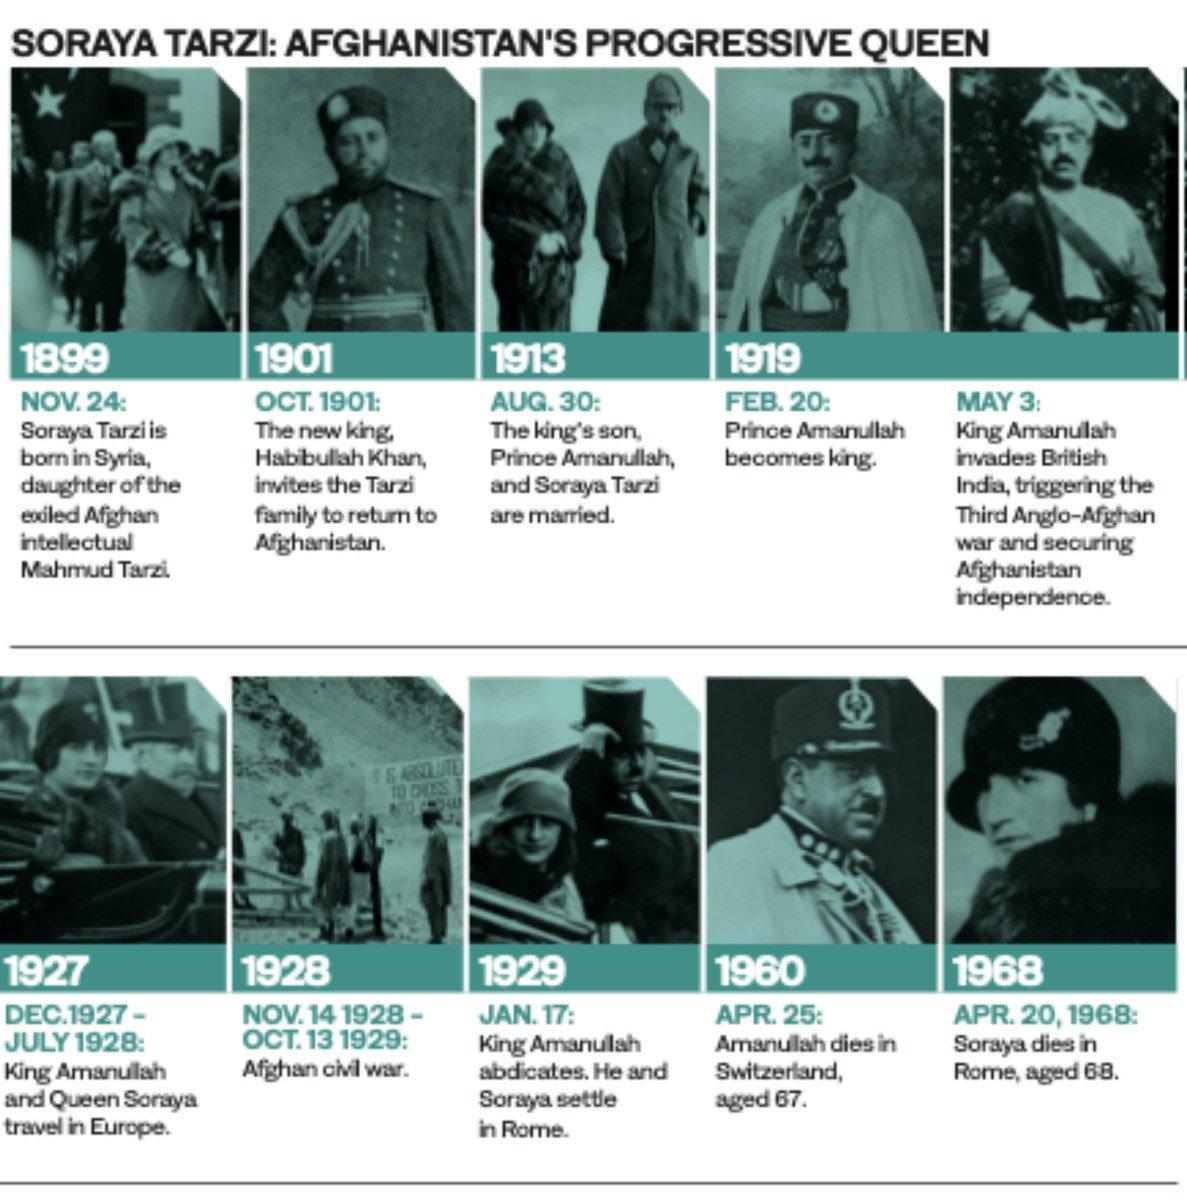 Suraya Tarzi Afghanistans prograssive gueen